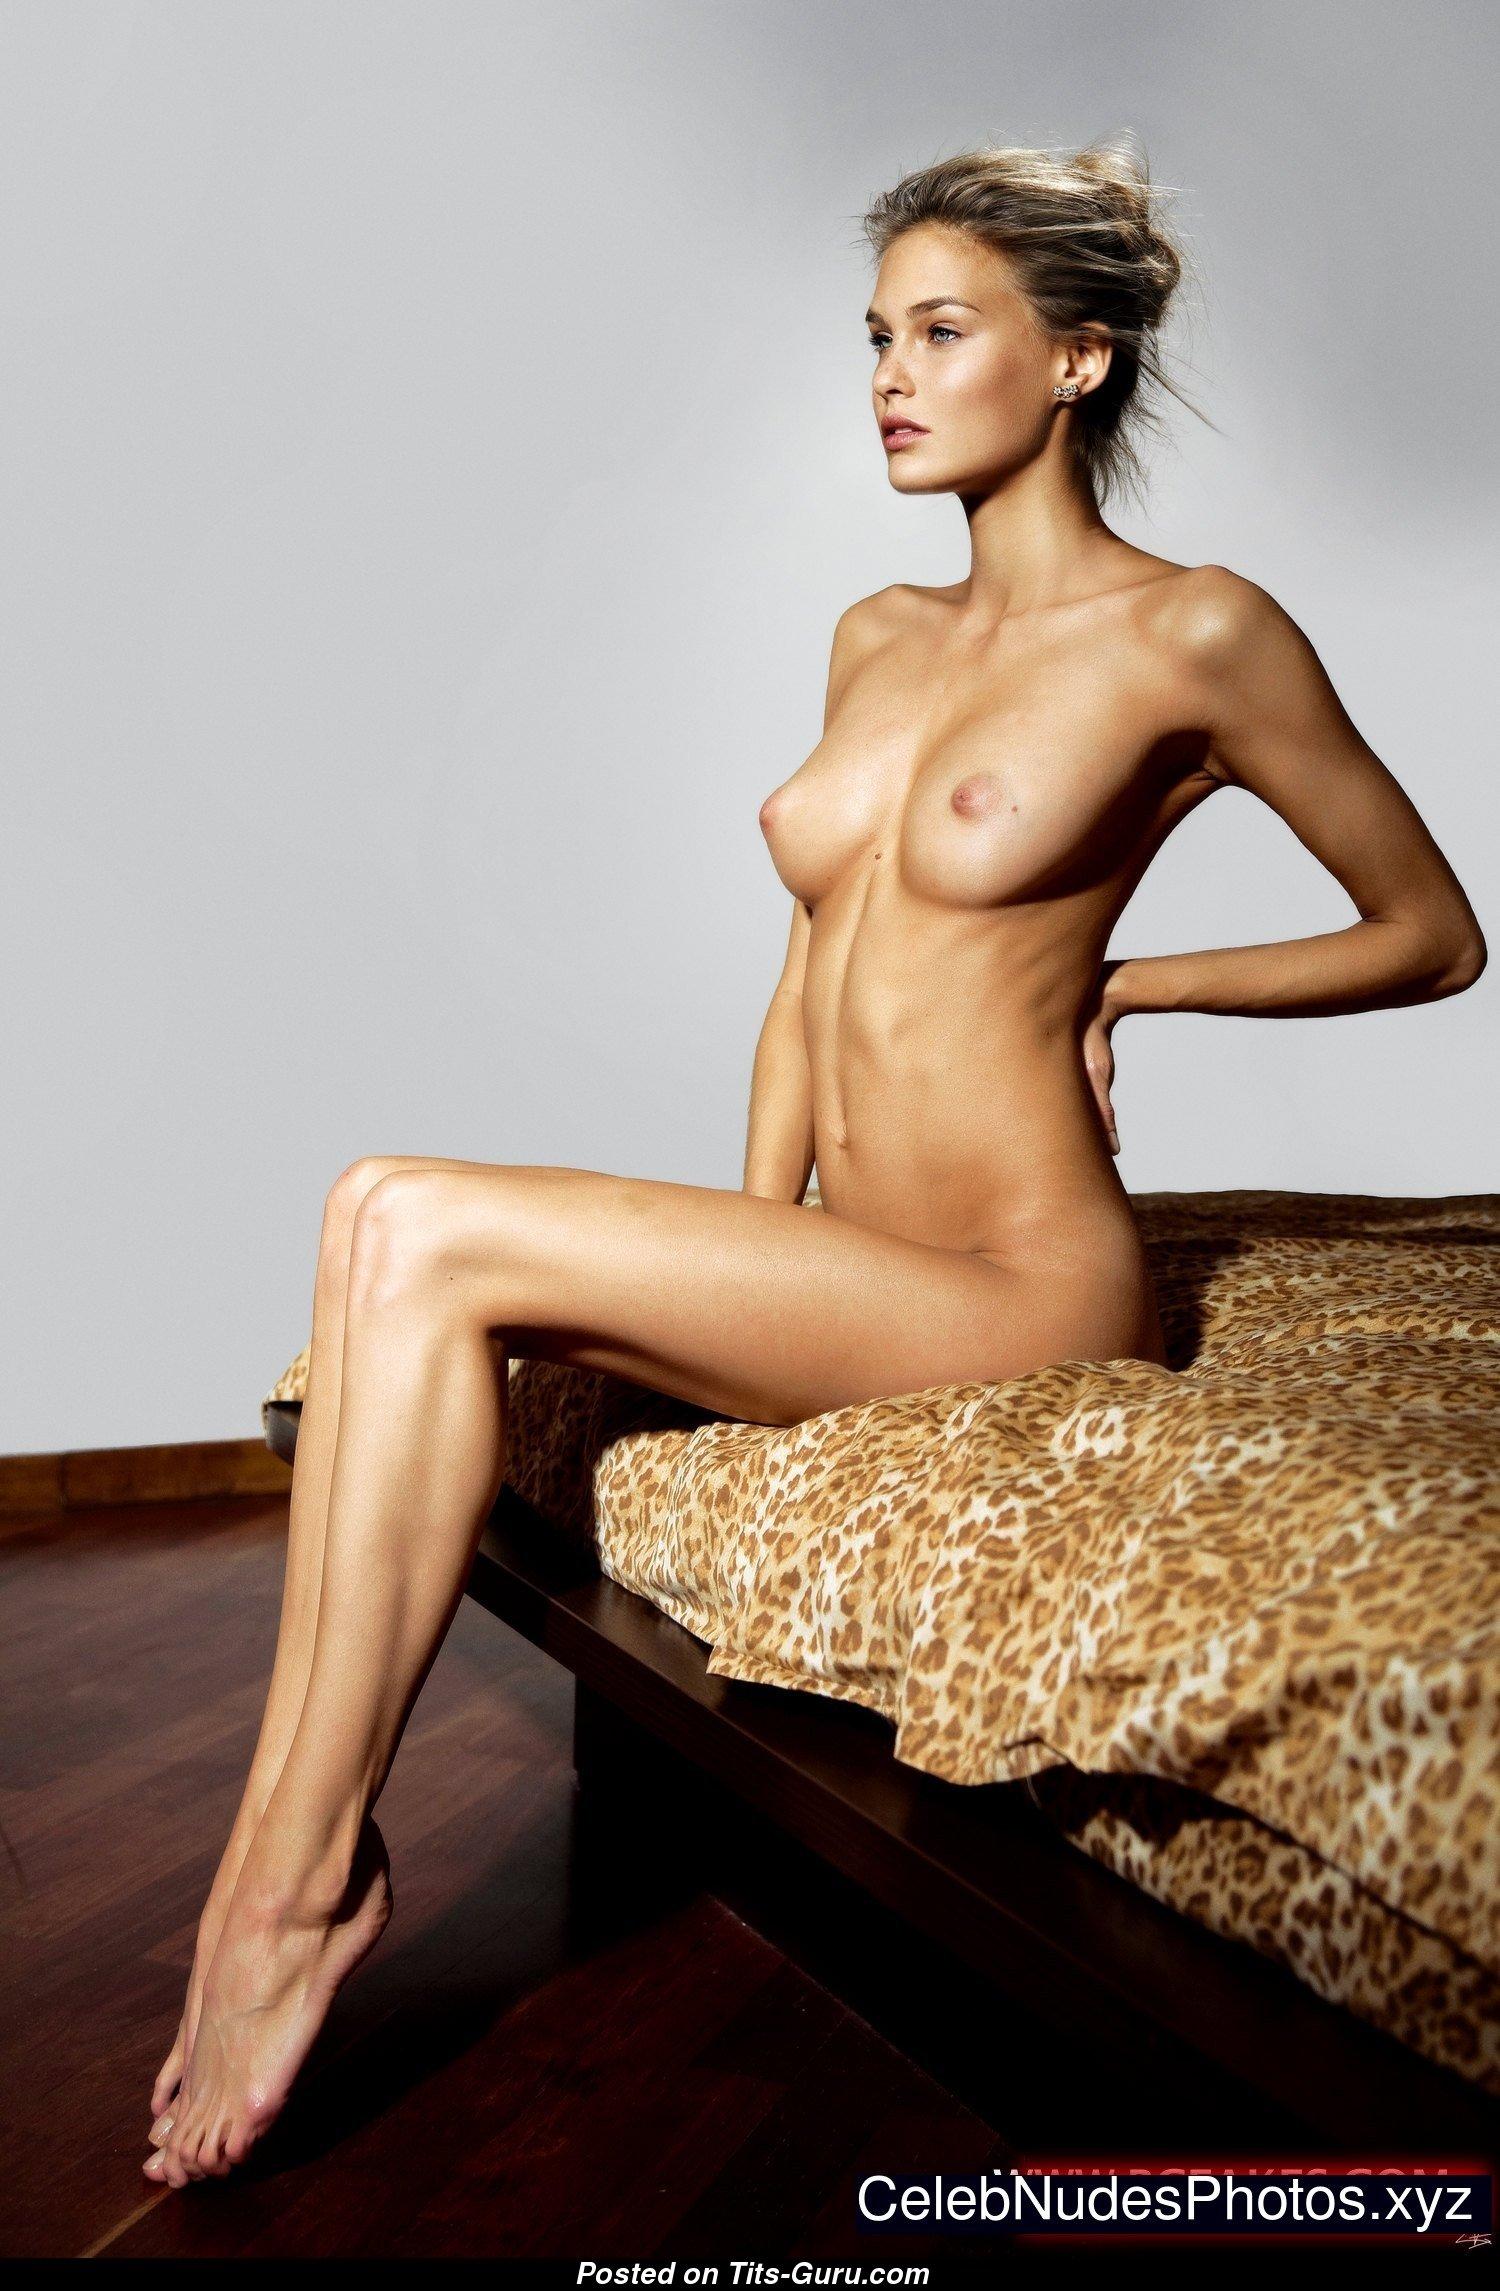 Topless Bar Refaeli nude (68 photo), Pussy, Bikini, Selfie, bra 2020